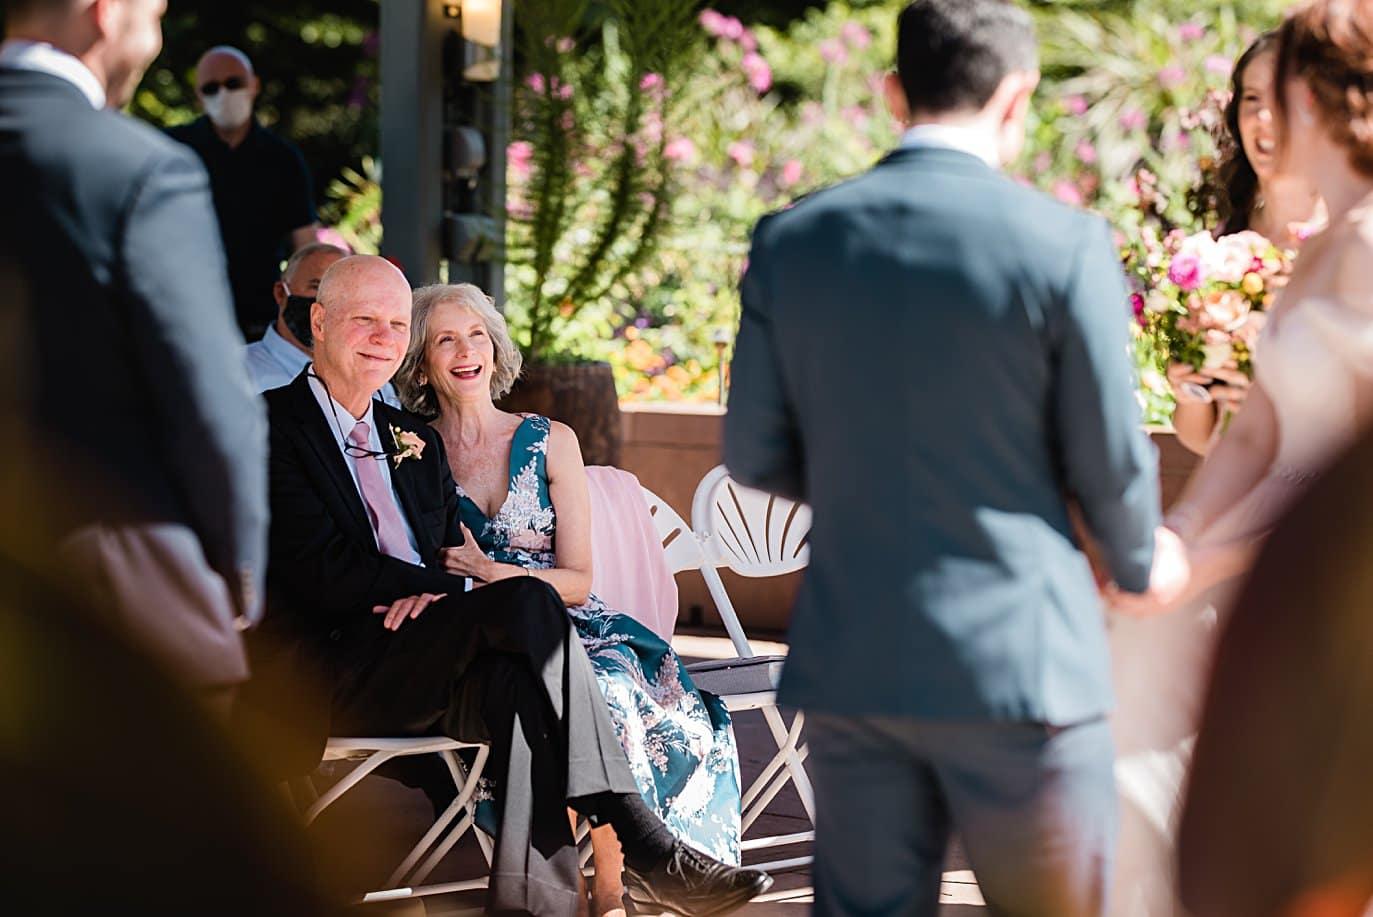 bride's parents look on during vows at Denver Botanic Gardens microwedding by Denver wedding photographer Jennie Crate